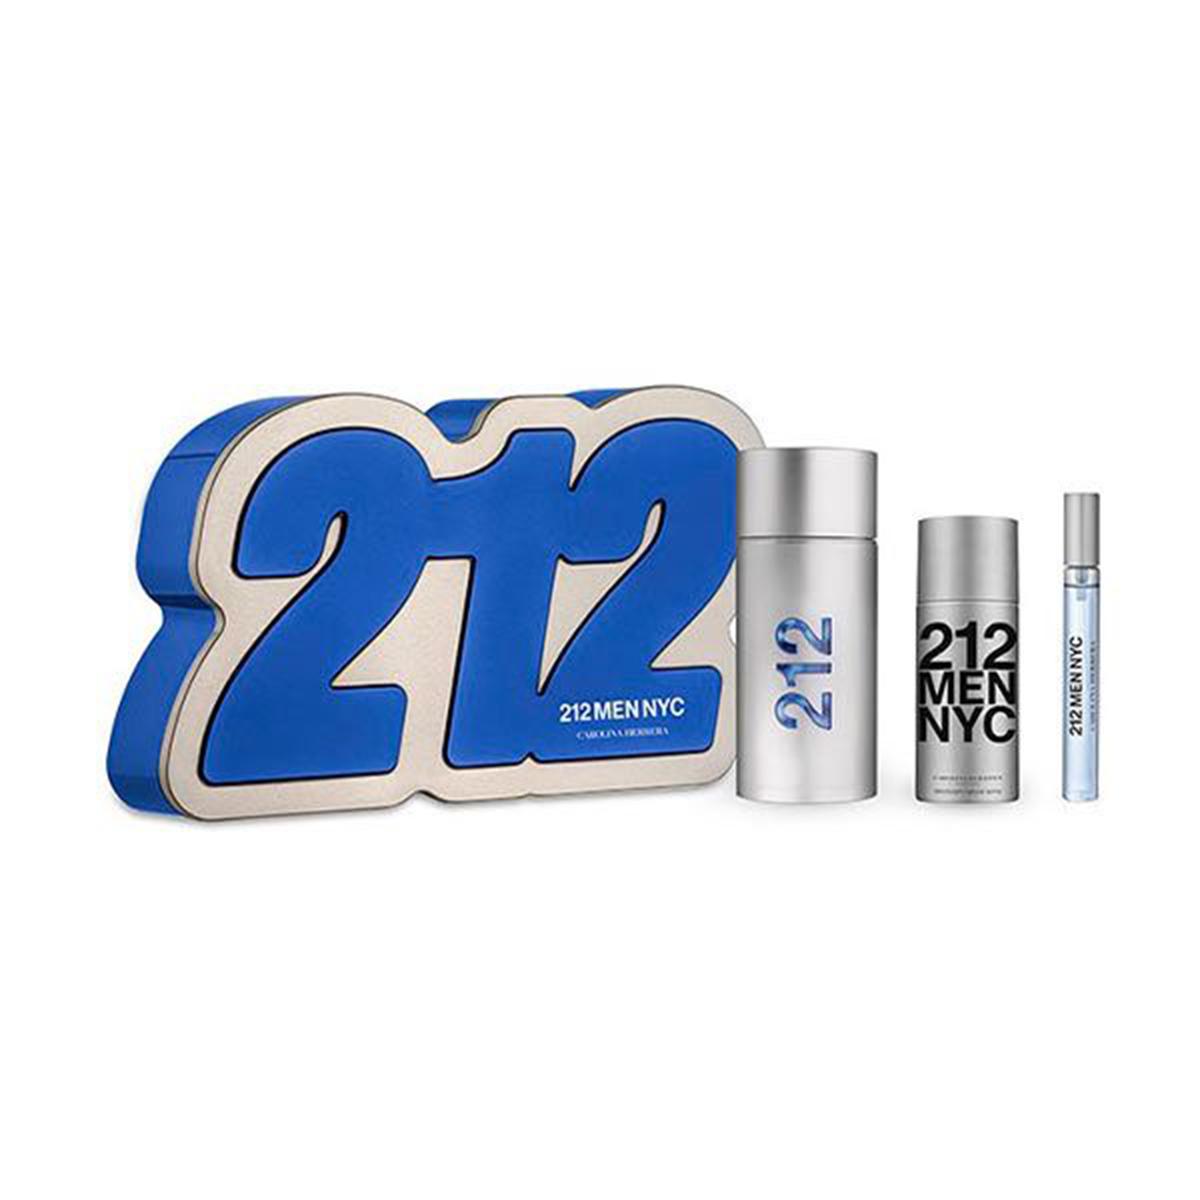 Carolina herrera 212 men eau de toilette 100ml vaporizador after shave gel 100ml miniatura